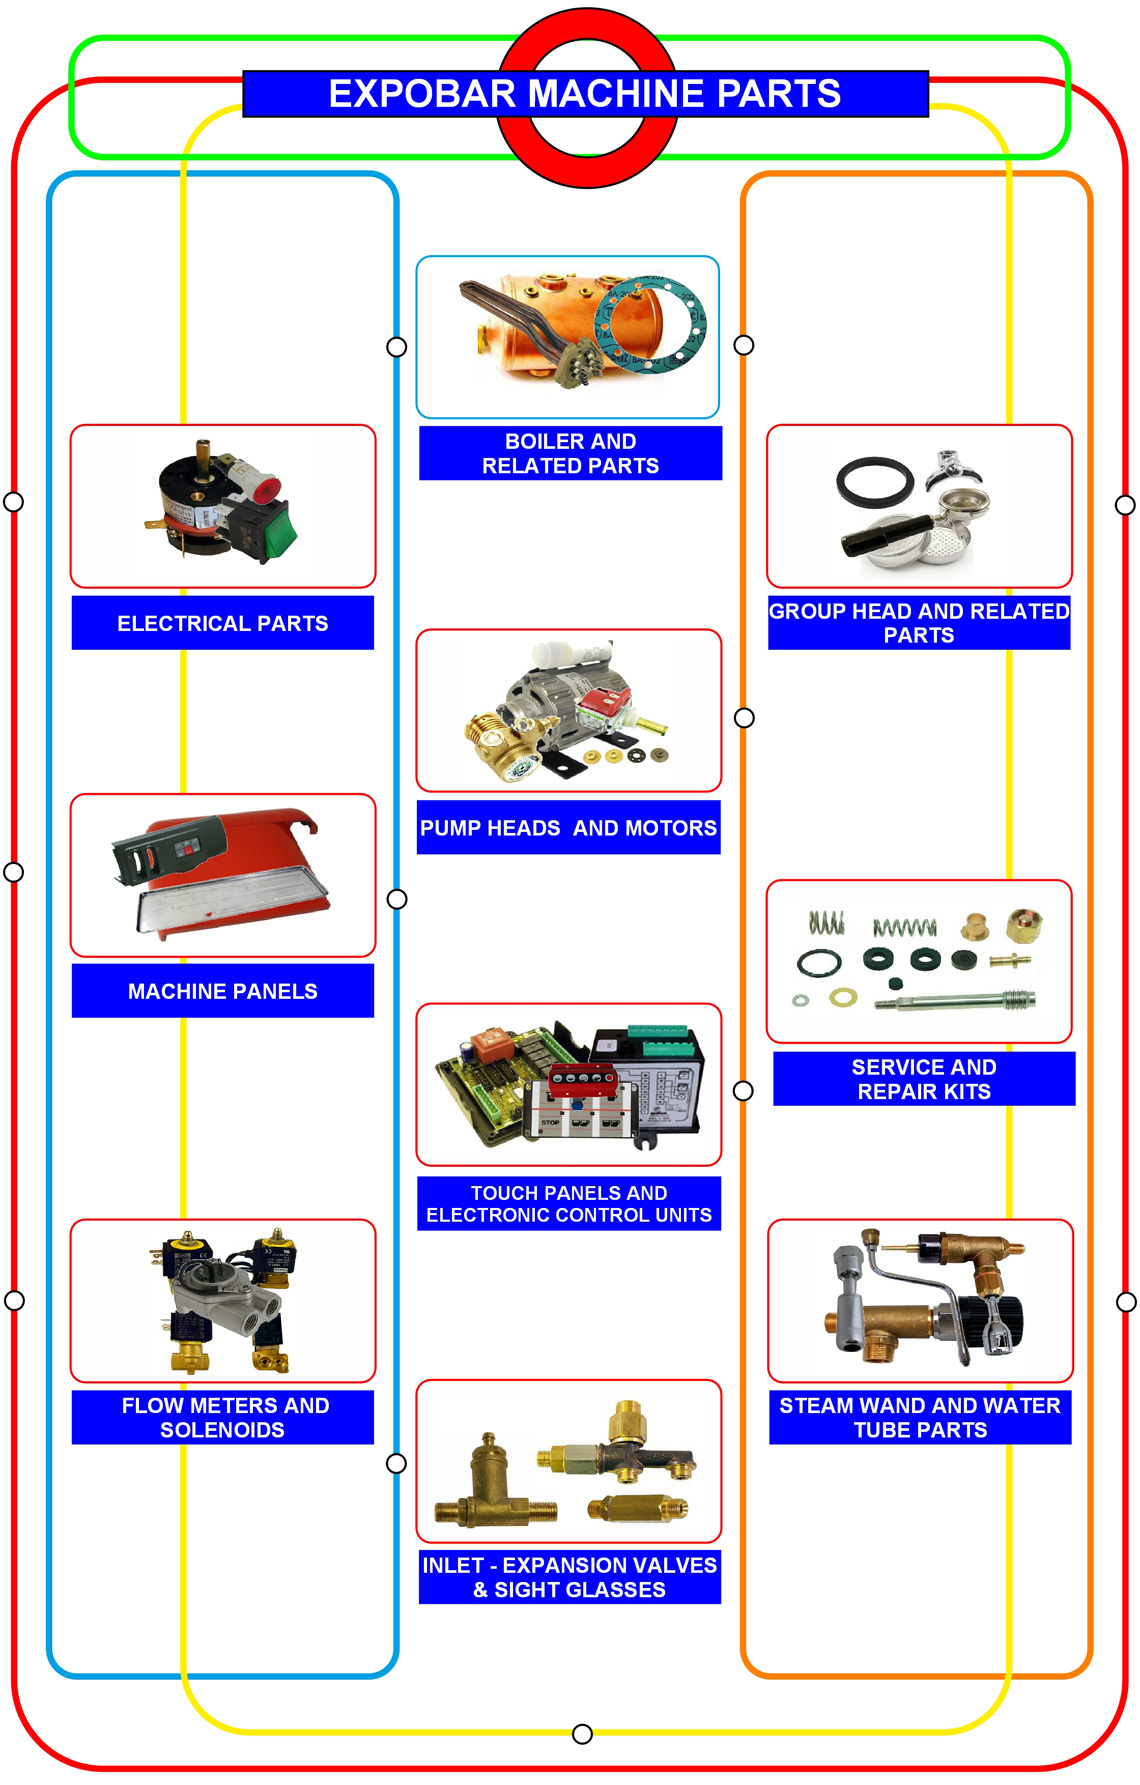 Expobar Espresso Machine Diagram Expert Wiring Diagrams Coffee Spare Parts Manual 2